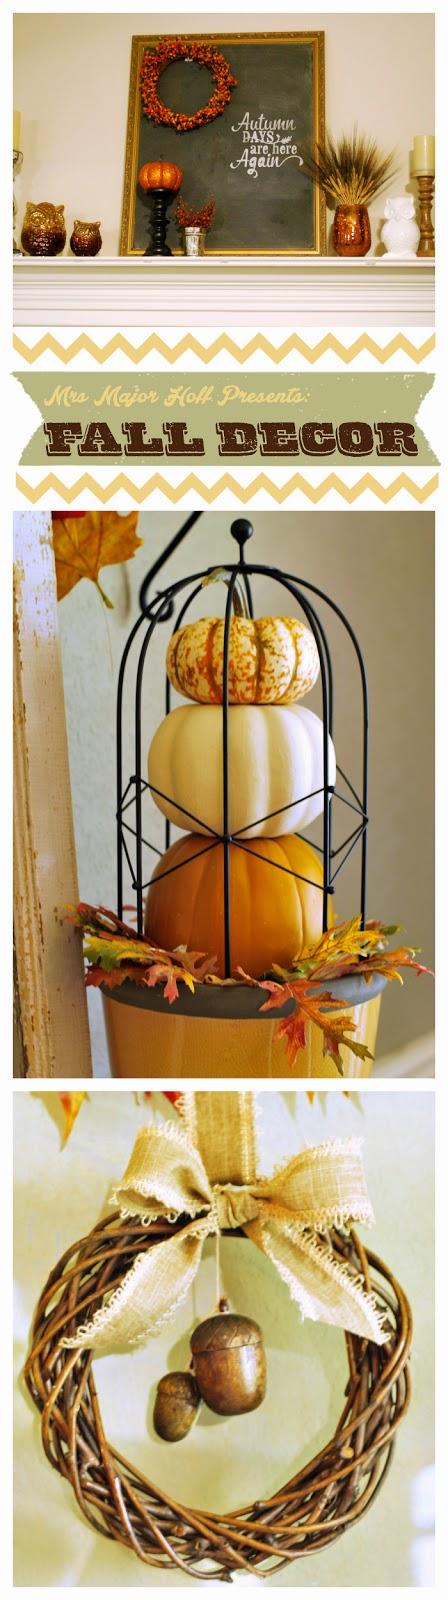 Bring Fall Decor into any home.